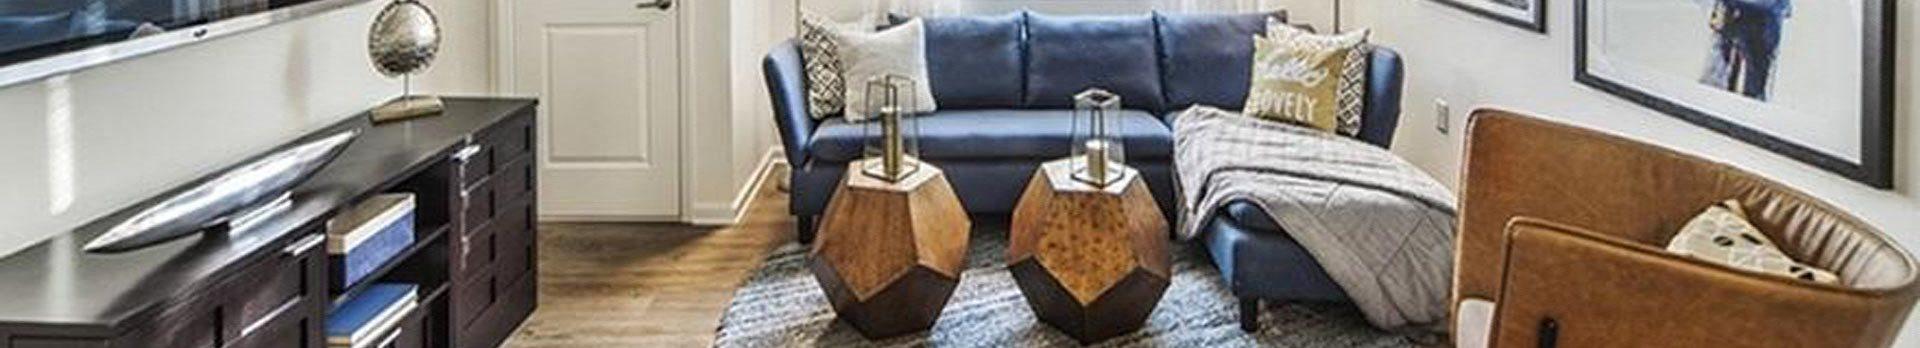 furnished apartment model living room